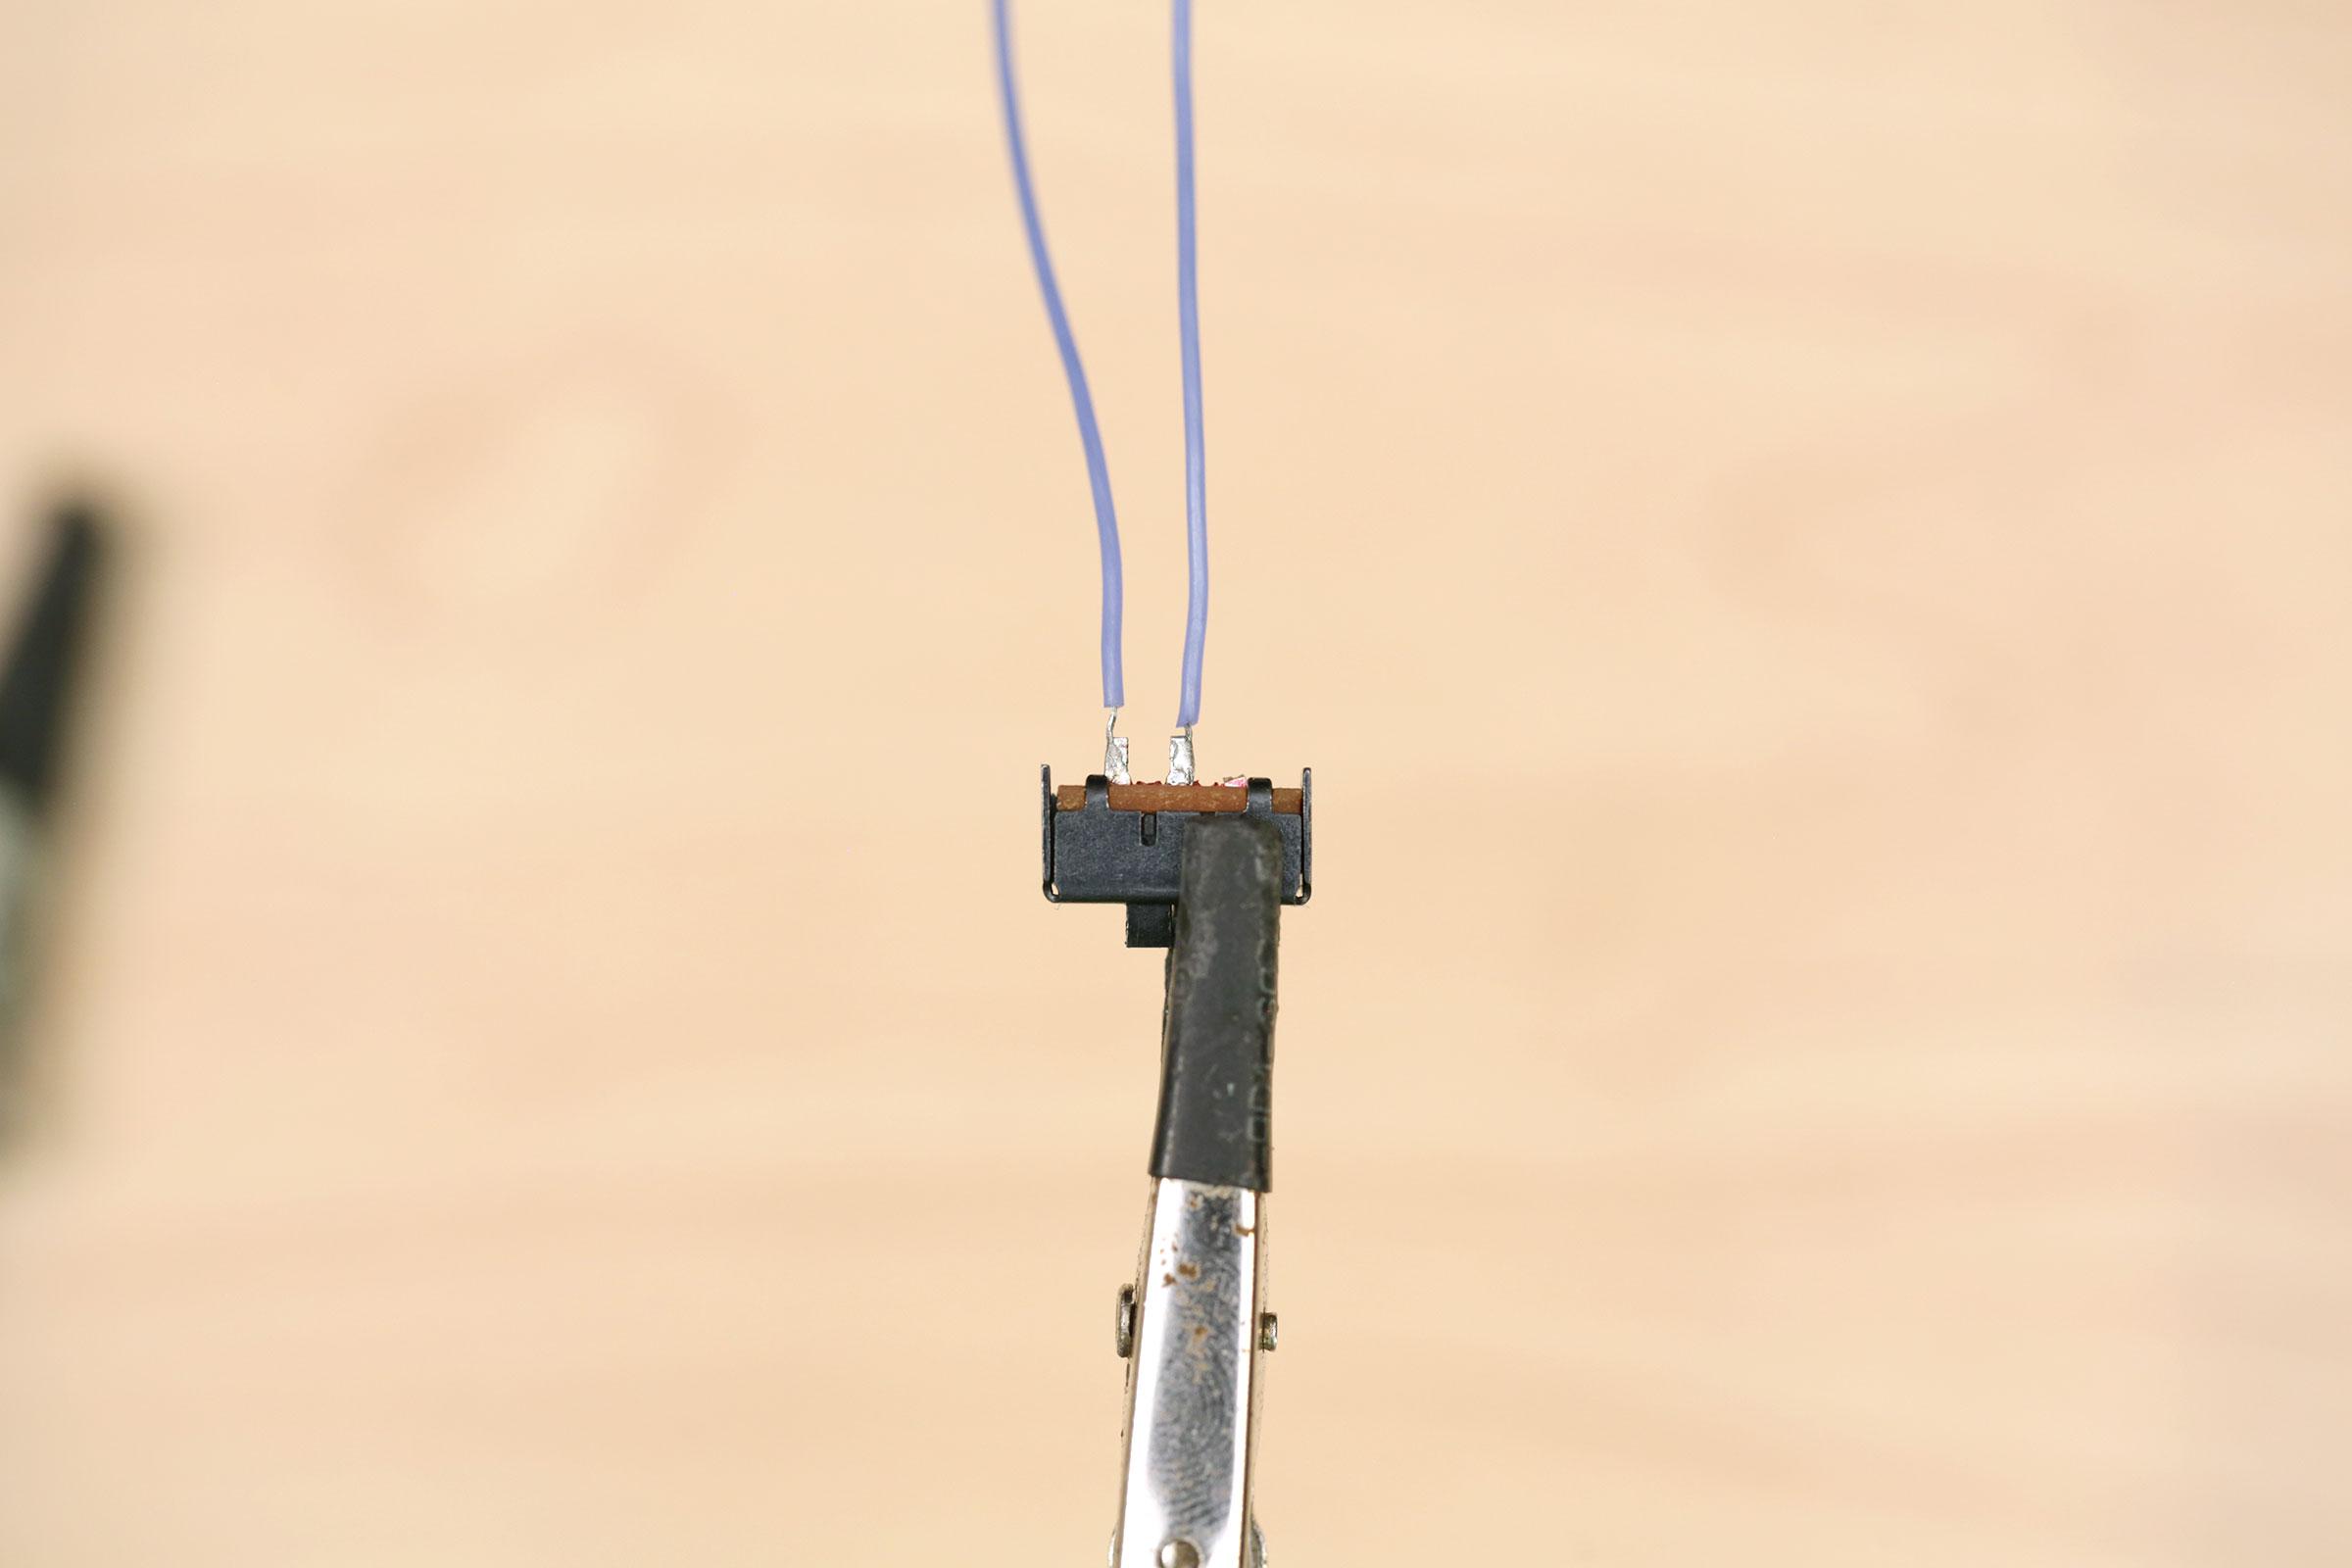 camera_switch-wires-soldered.jpg